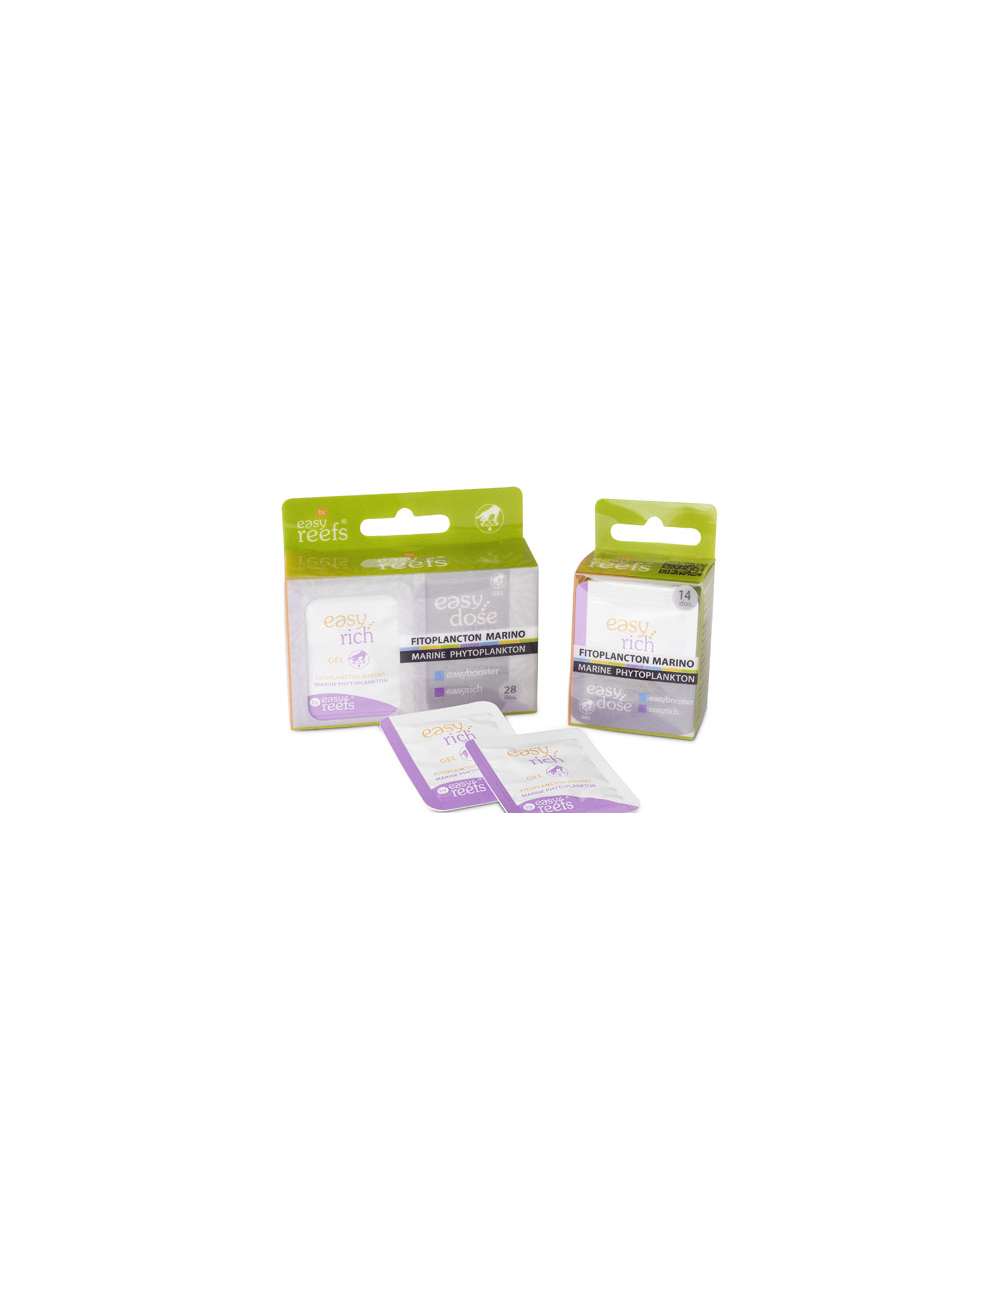 Easy Reefs - EasyRich 14- Phytoplancton en gel - 14 mono-doses